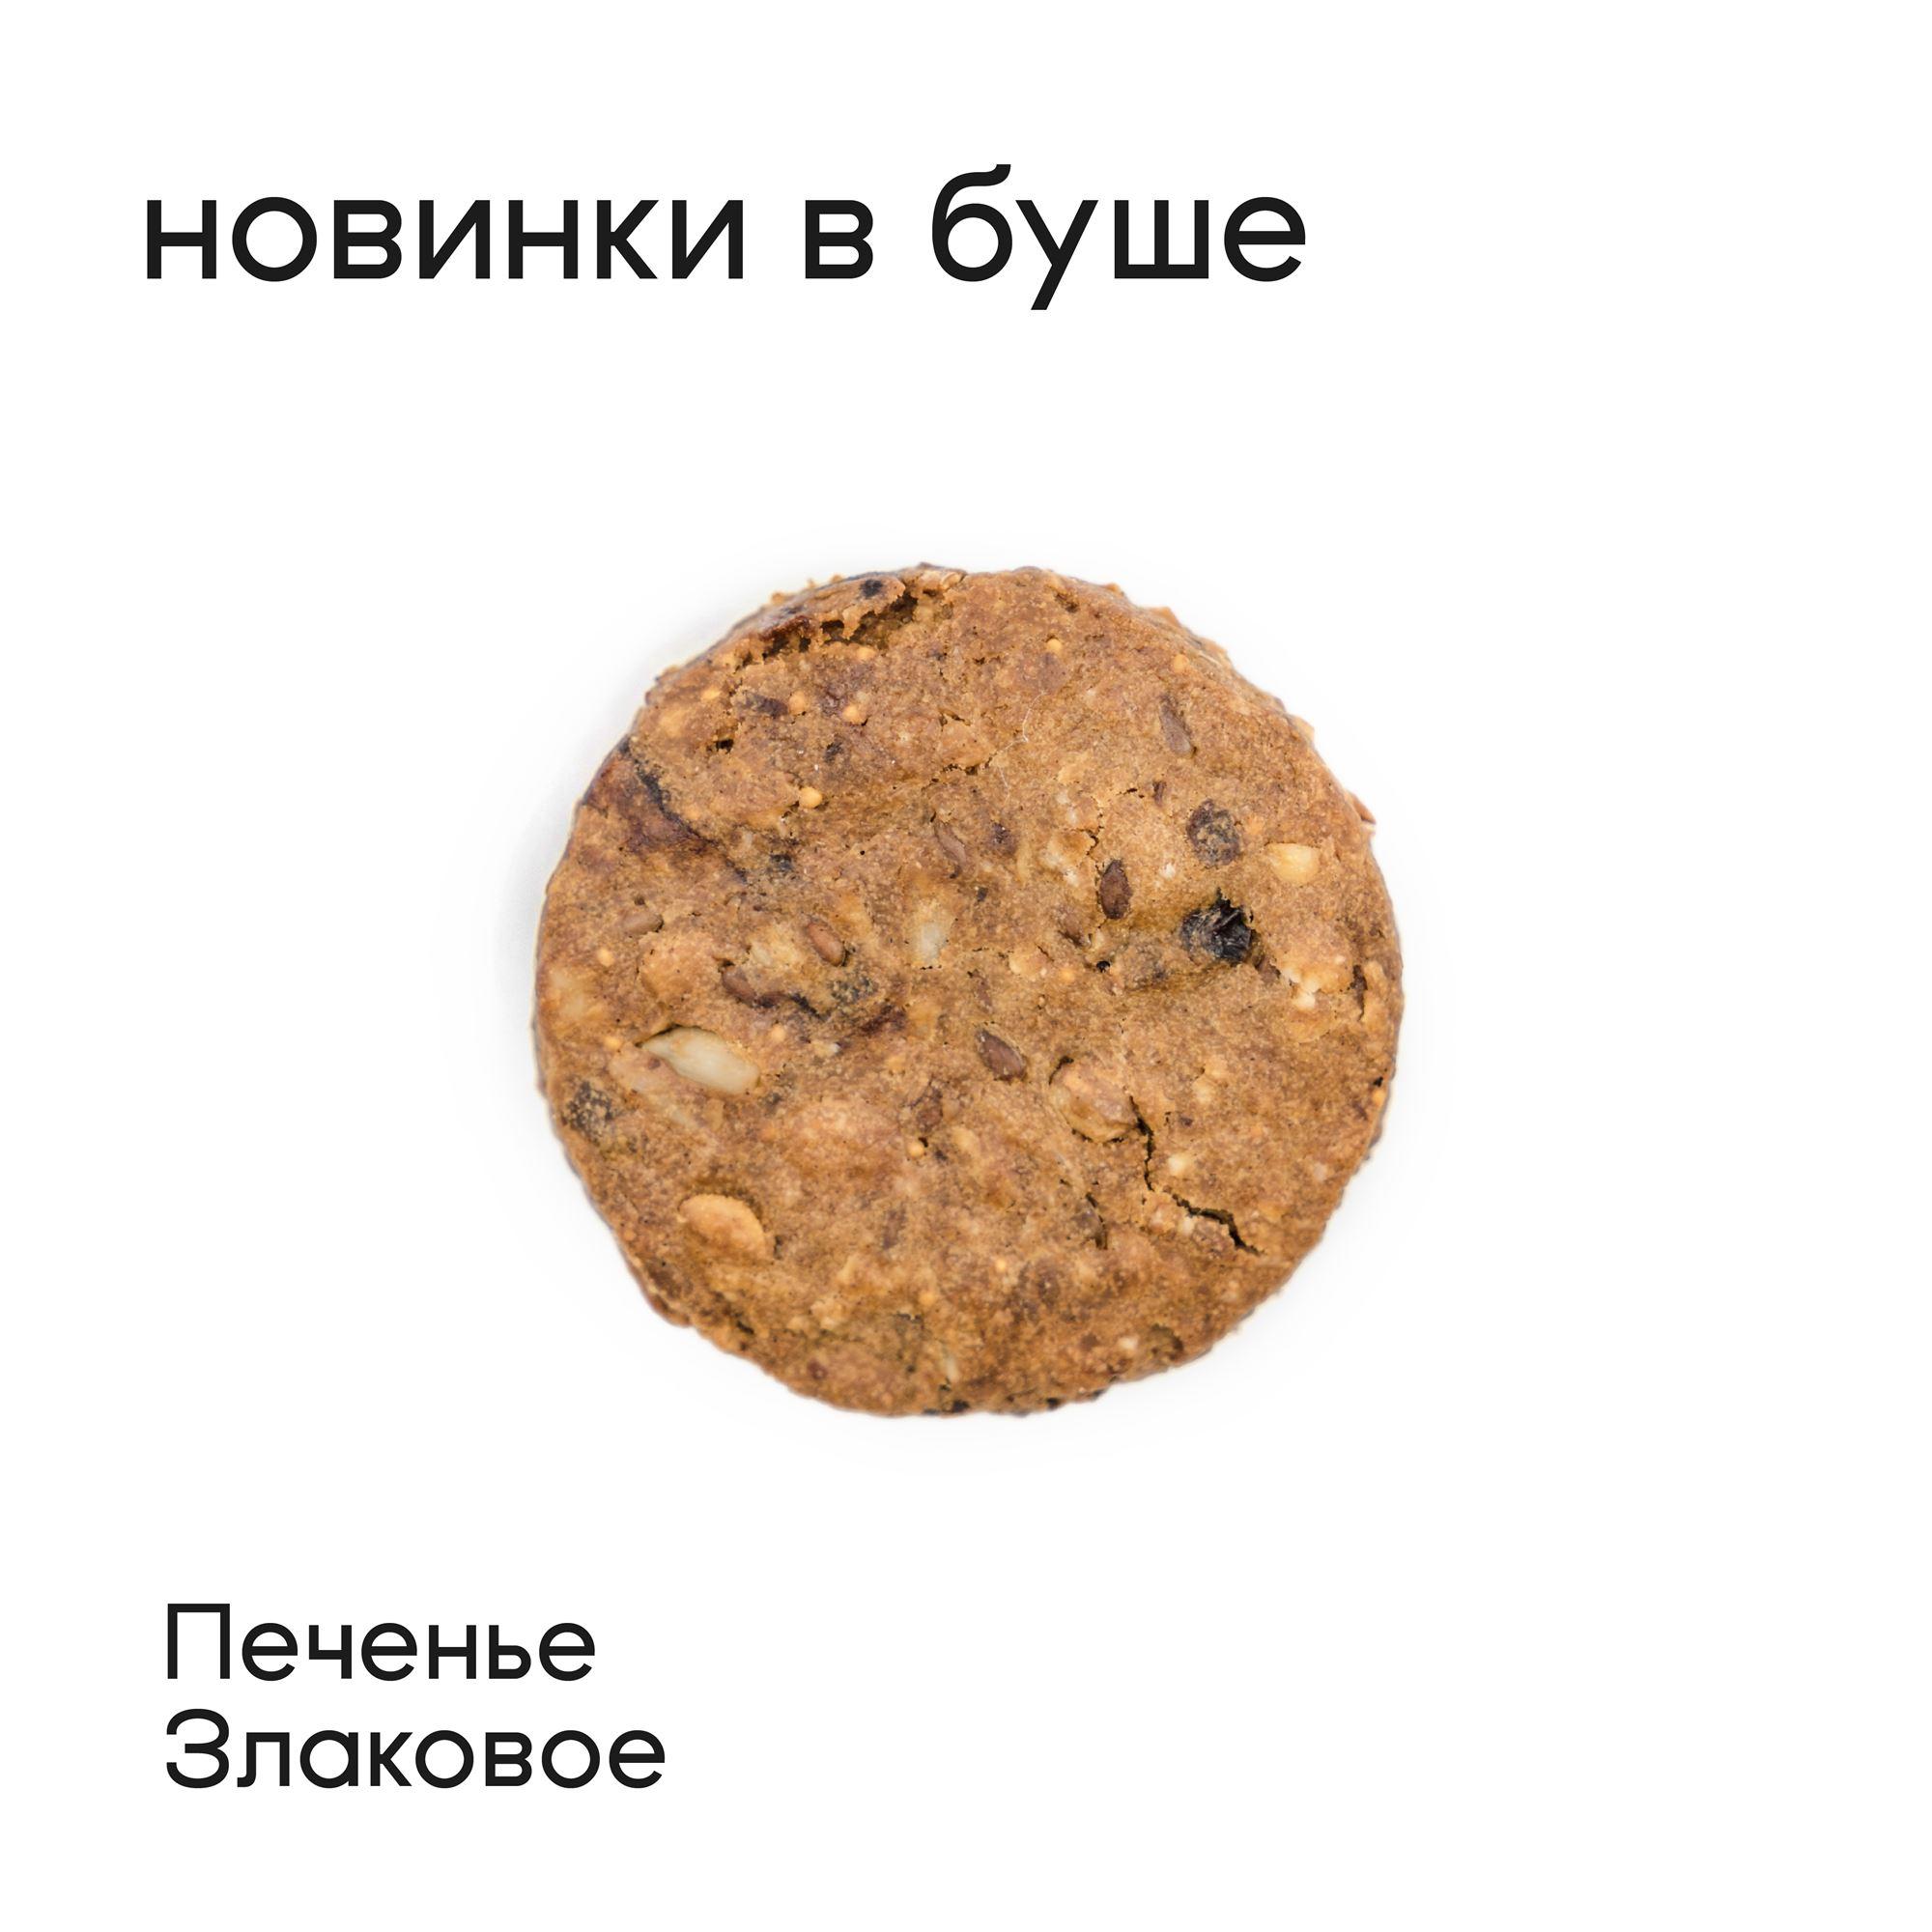 Новинка – Злаковое печенье